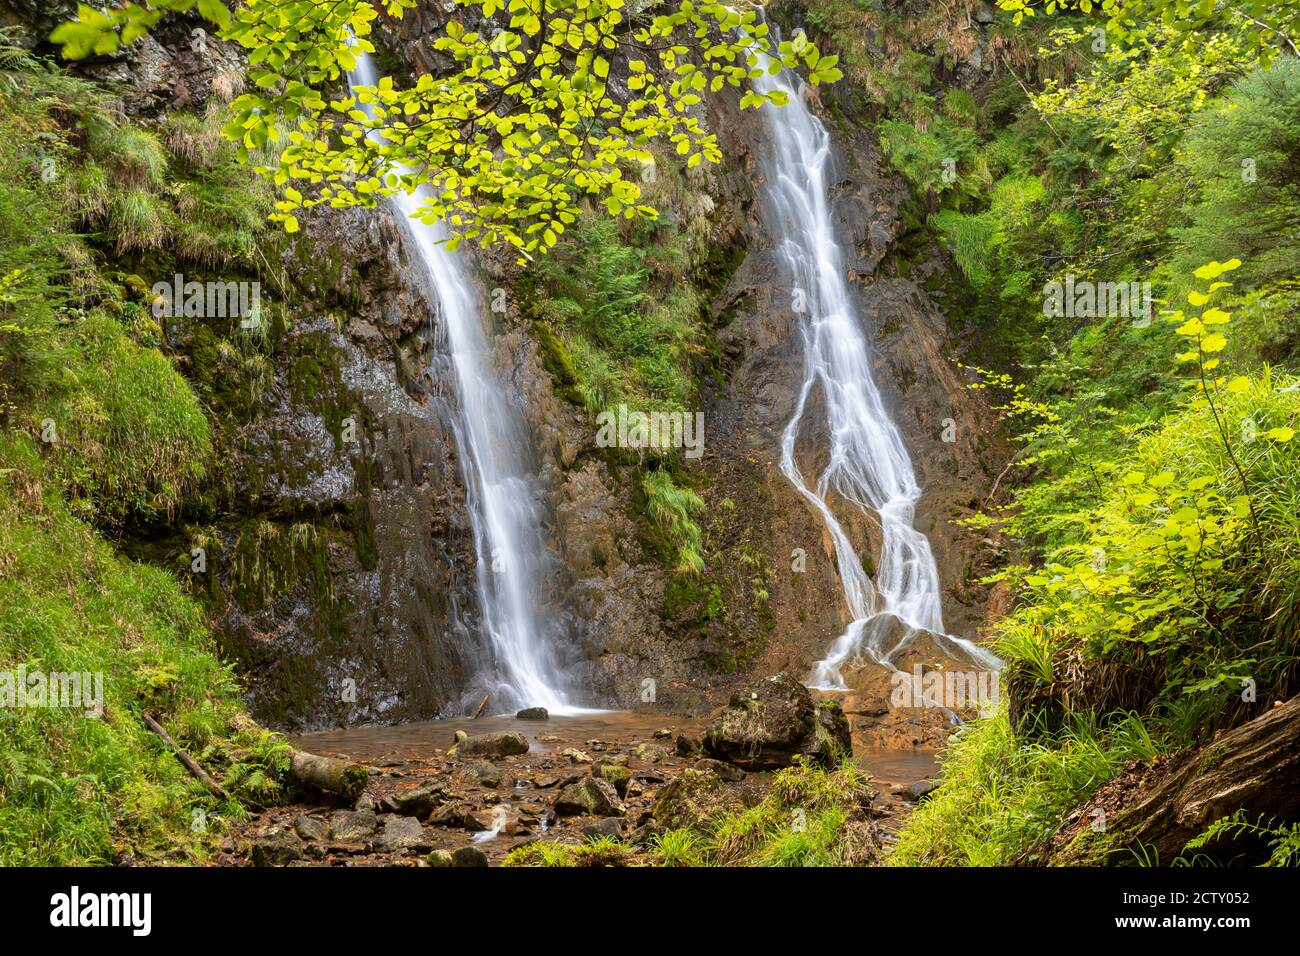 Grey Mare's Tail waterfall, Llanrwst, Snowdonia, North Wales Stock Photo